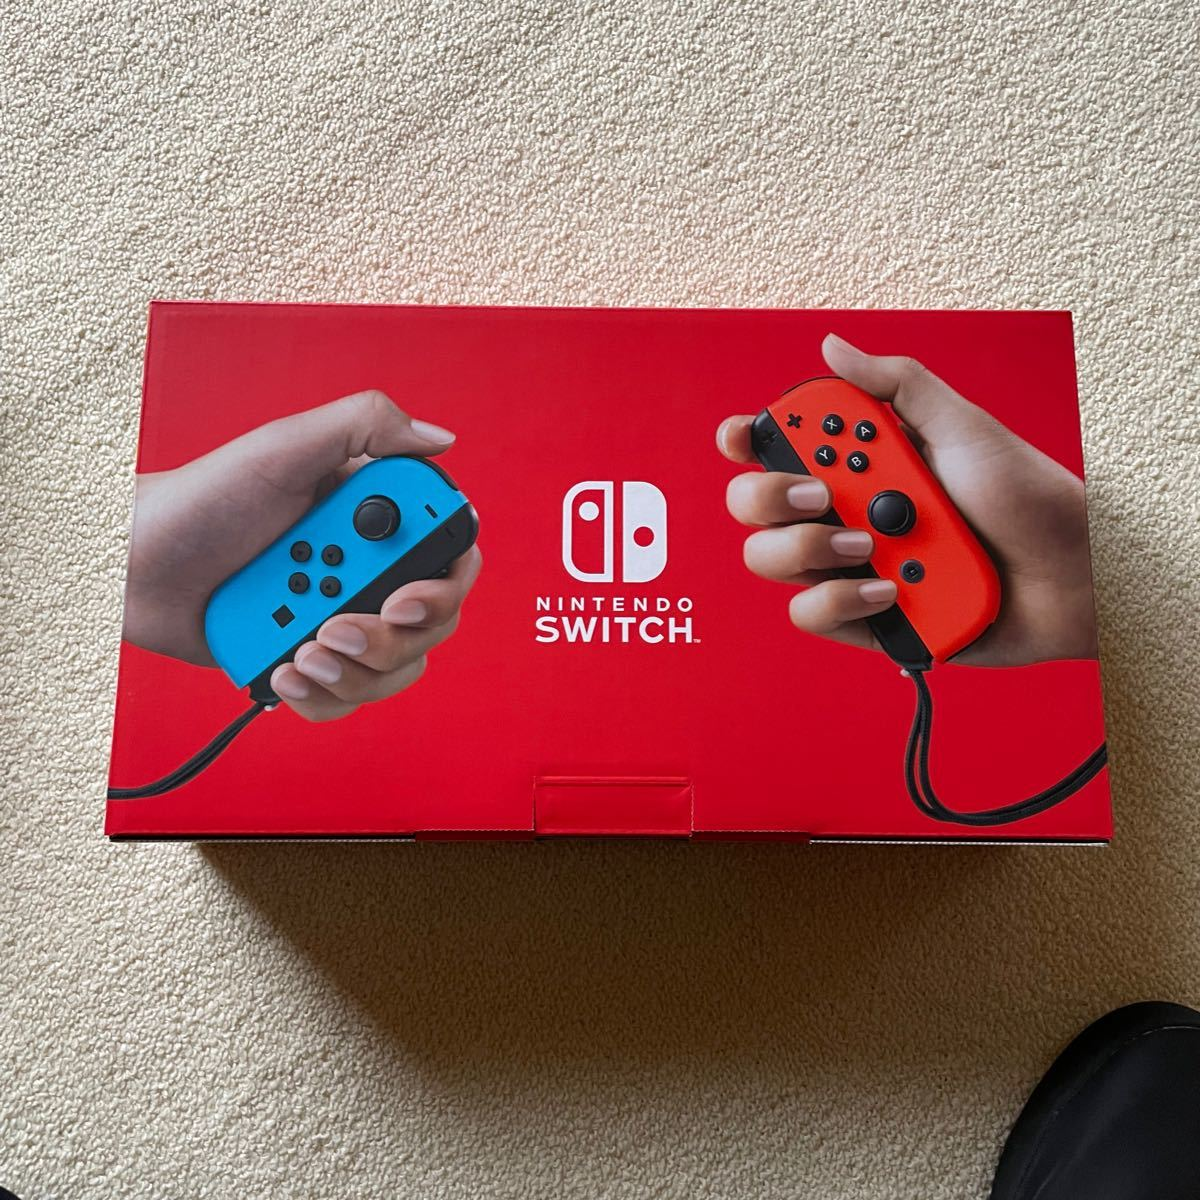 Nintendo Switch ニンテンドースイッチ本体 ネオンブルー ネオンレッド 【新品未使用】